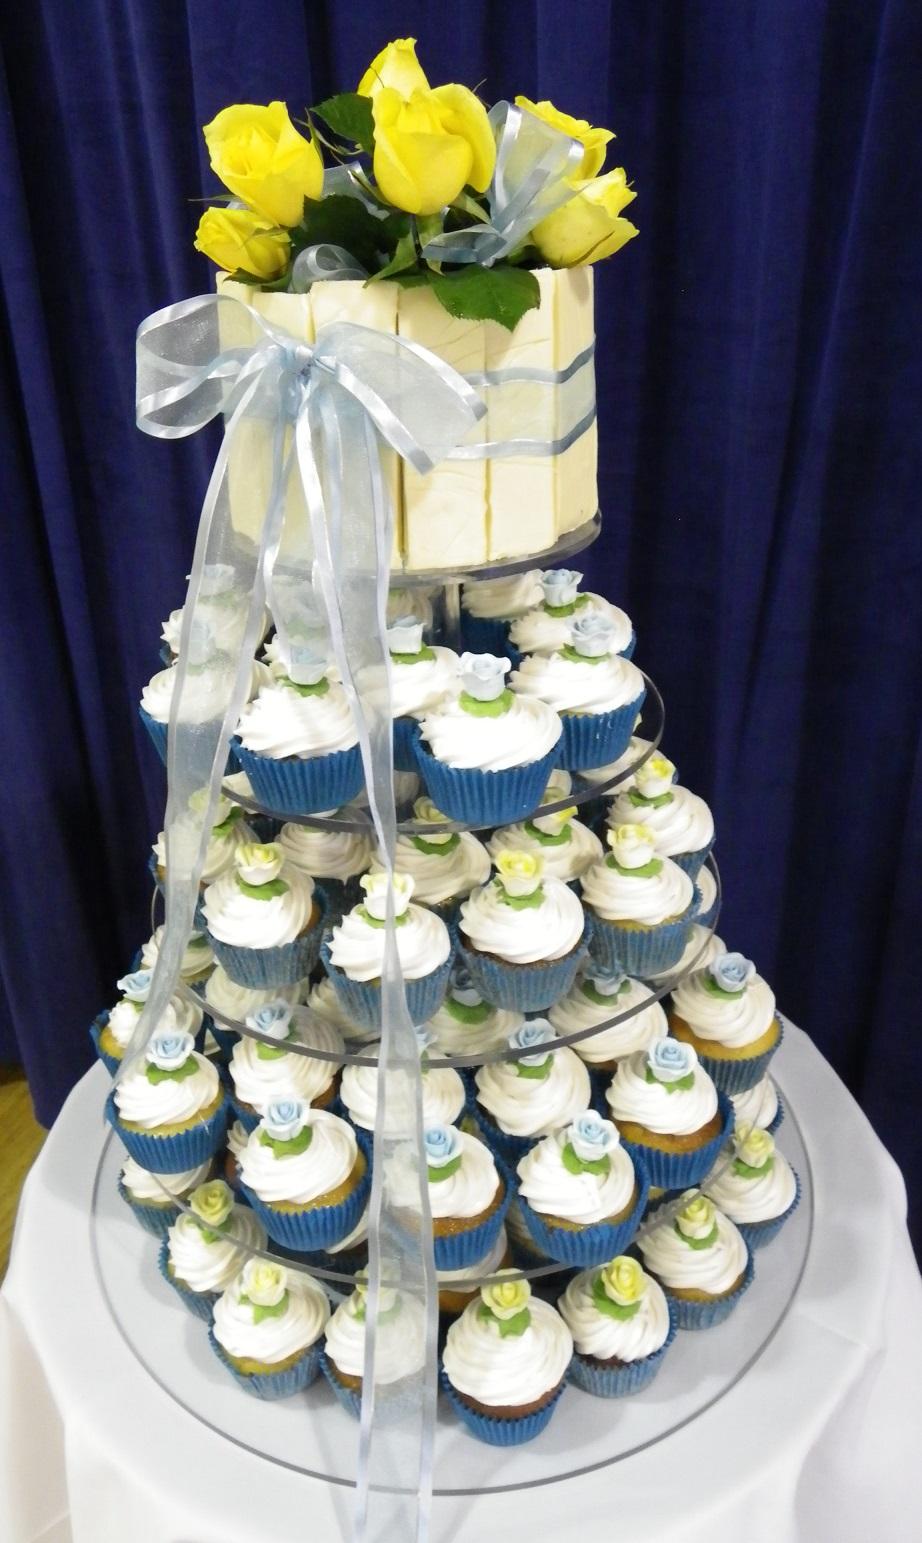 White Chocolate Bliss Cupcakes & White Chocolate Torte